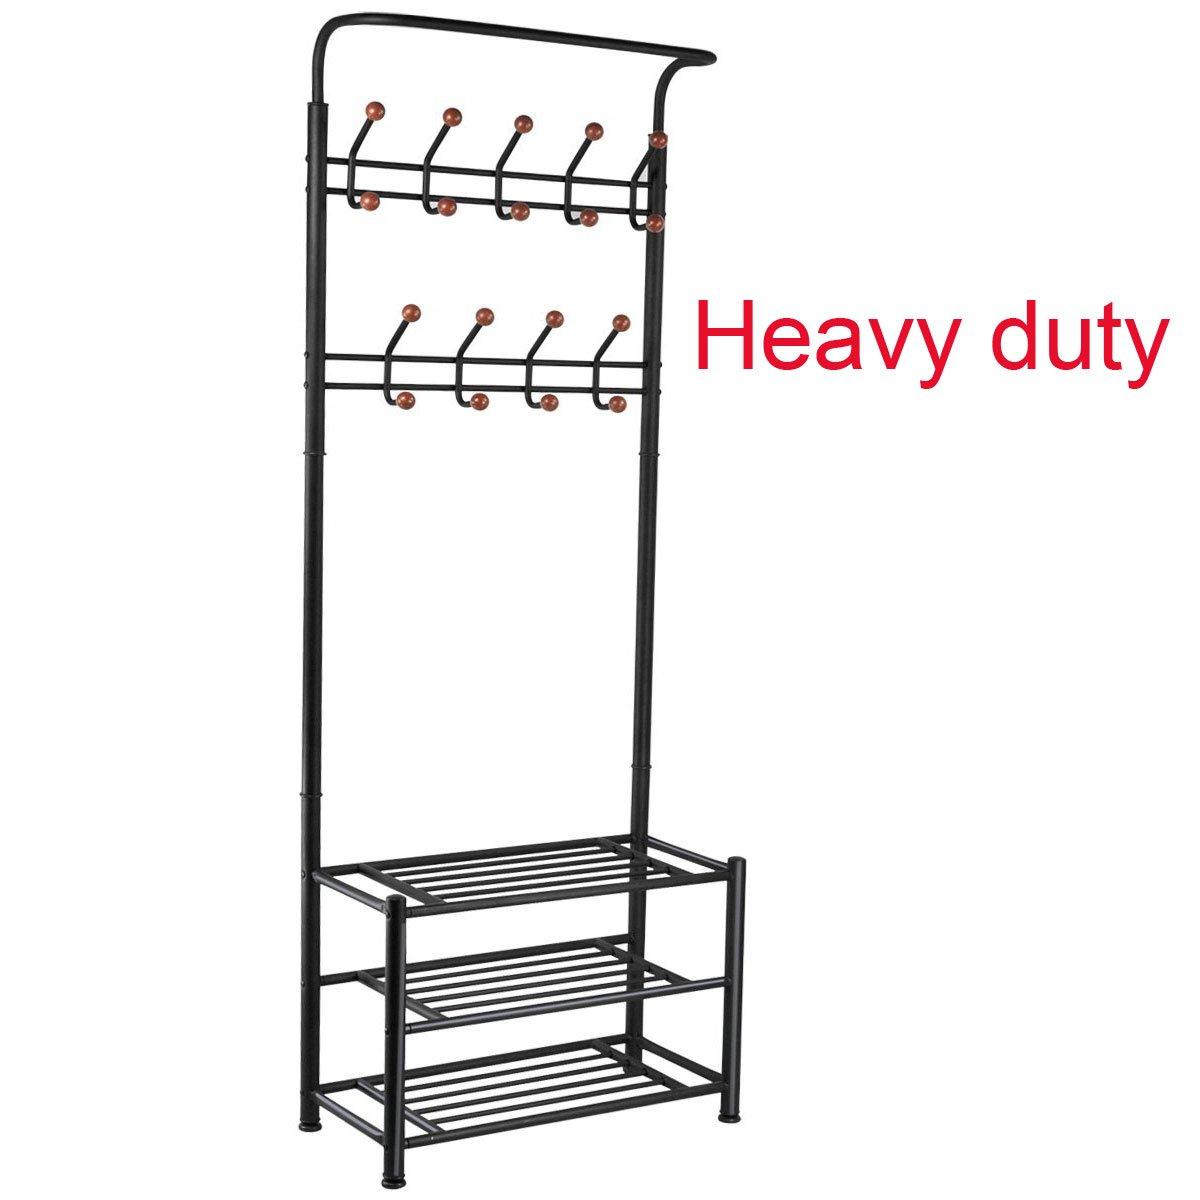 FYHEART Heavy Duty Entryway Hall Coat Shoe Rack 3-tier Shoe Bench Shelves Organizer with Coat Hat Umbrella Rack 18 Hooks for Hallway Entryway Metal,Black